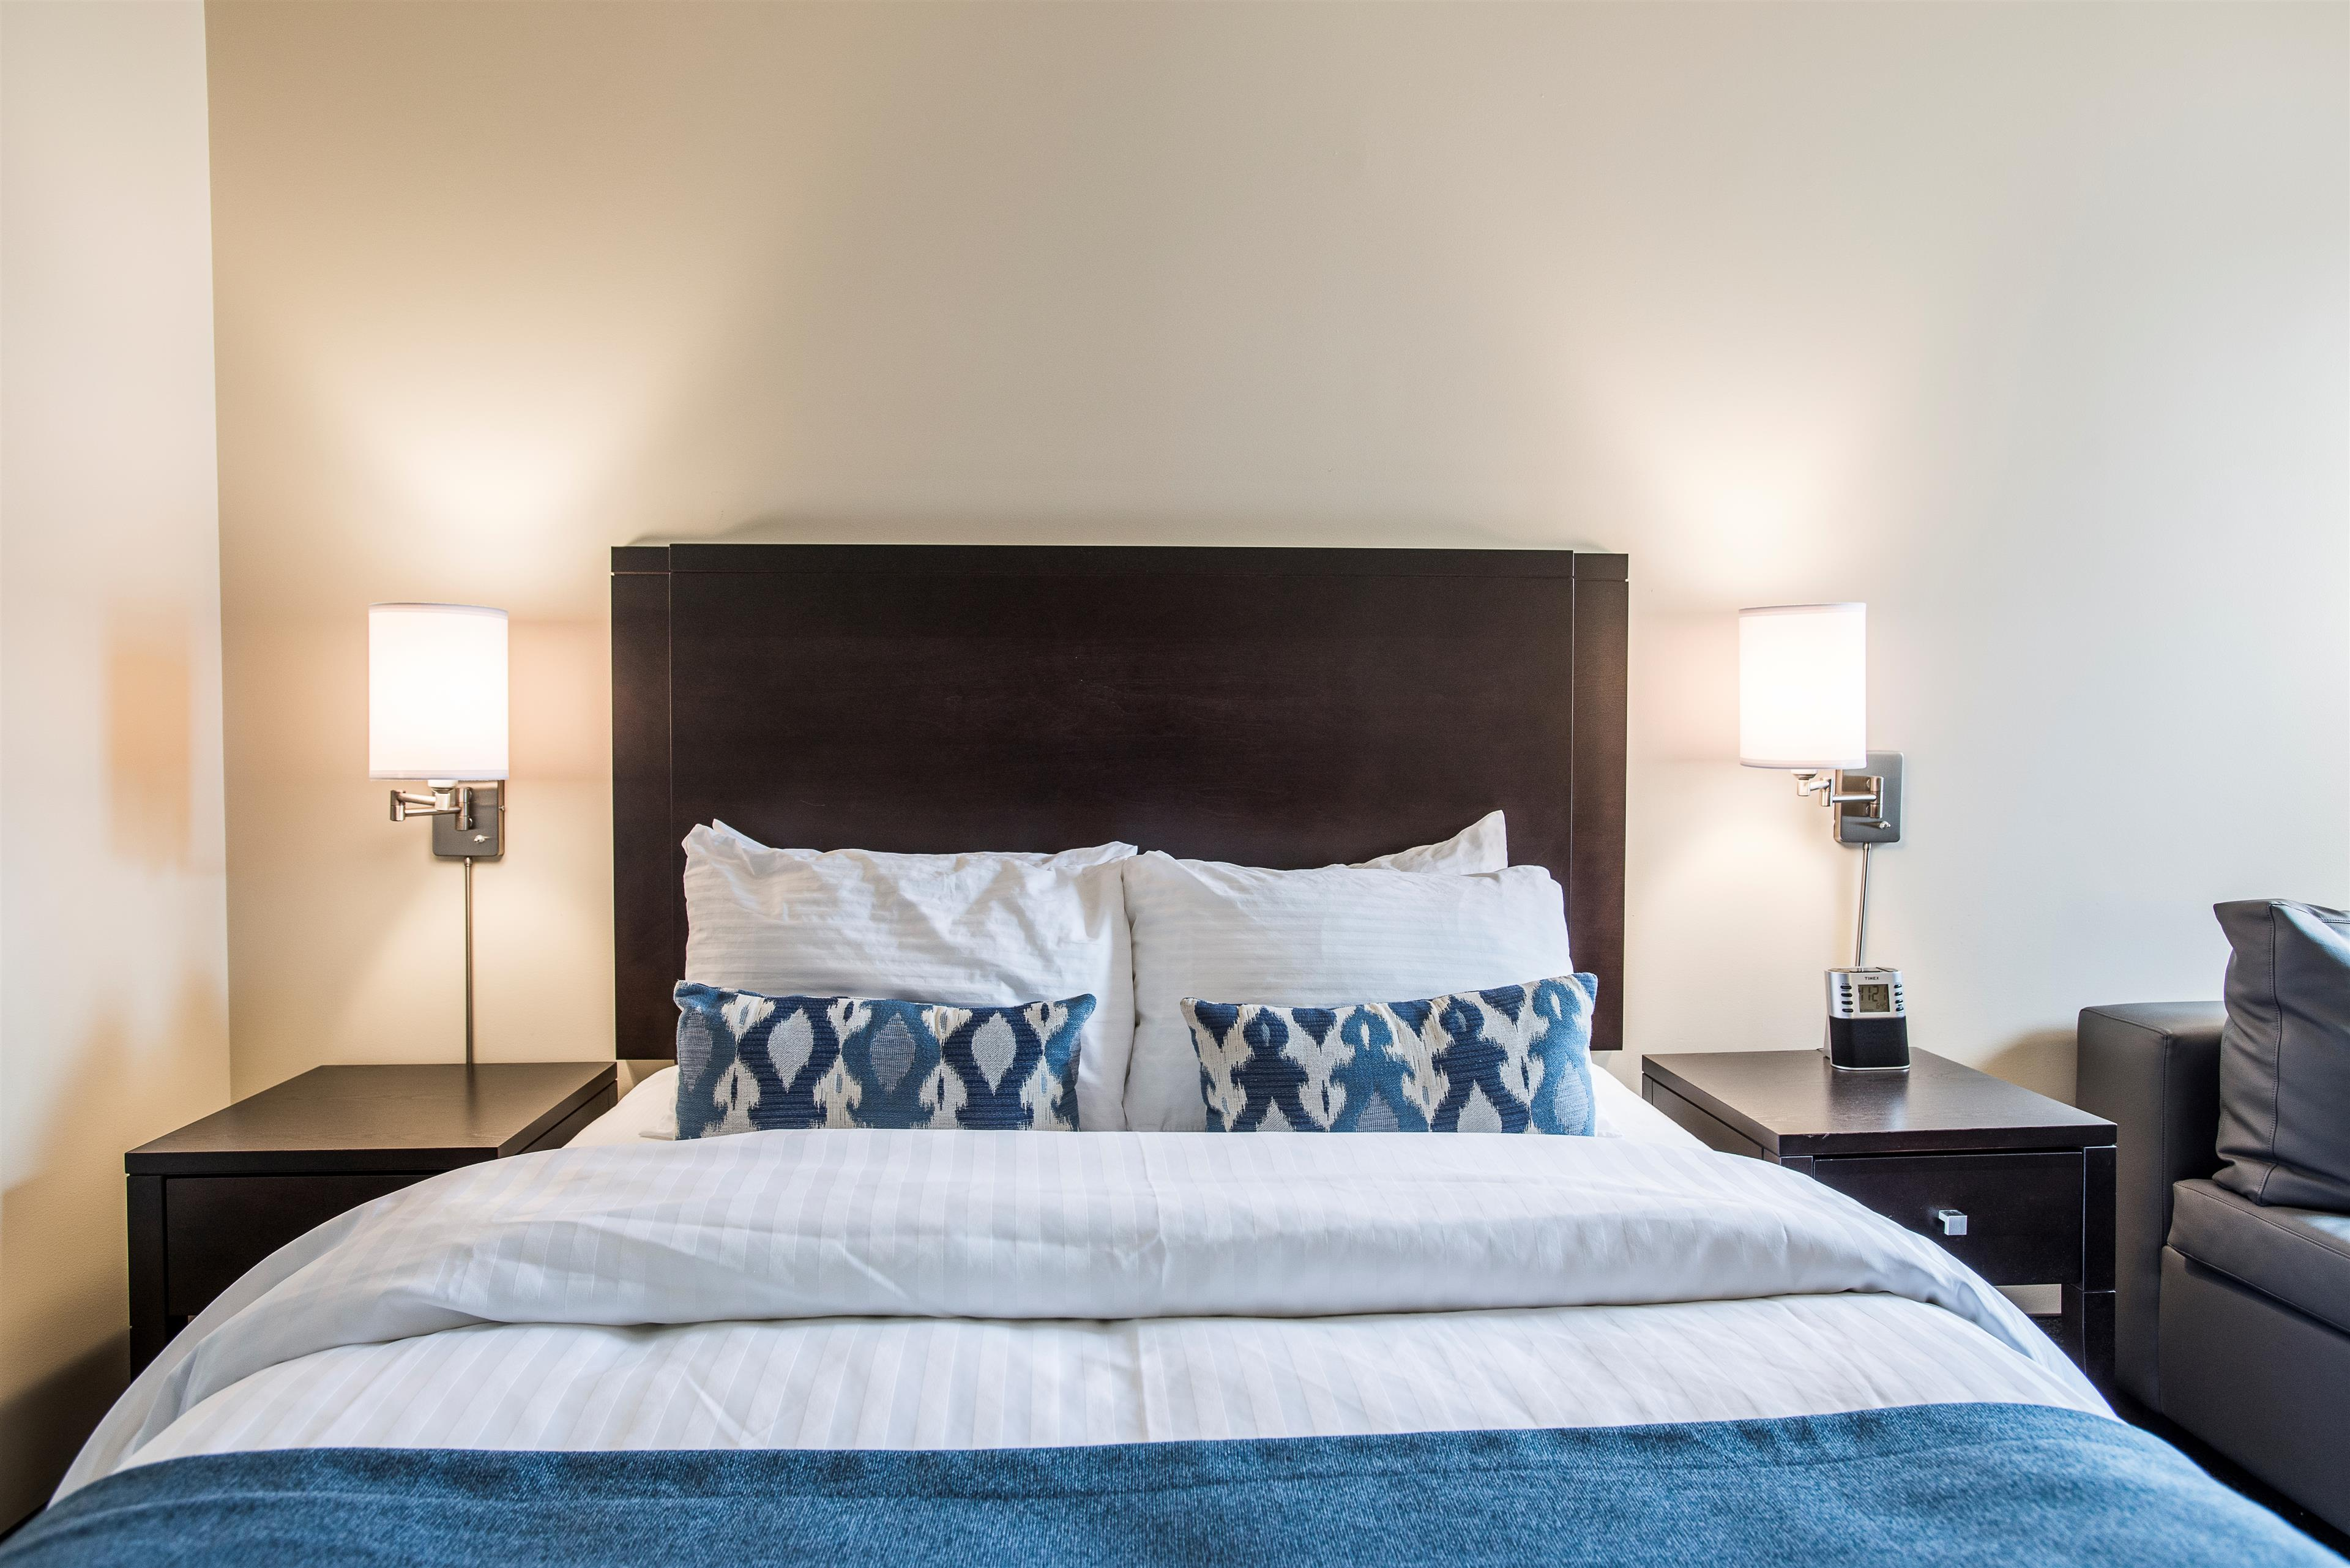 Best Western Plus Hotel Albert Rouyn-Noranda à Rouyn-Noranda: Executive One Queen Bed Guest Room